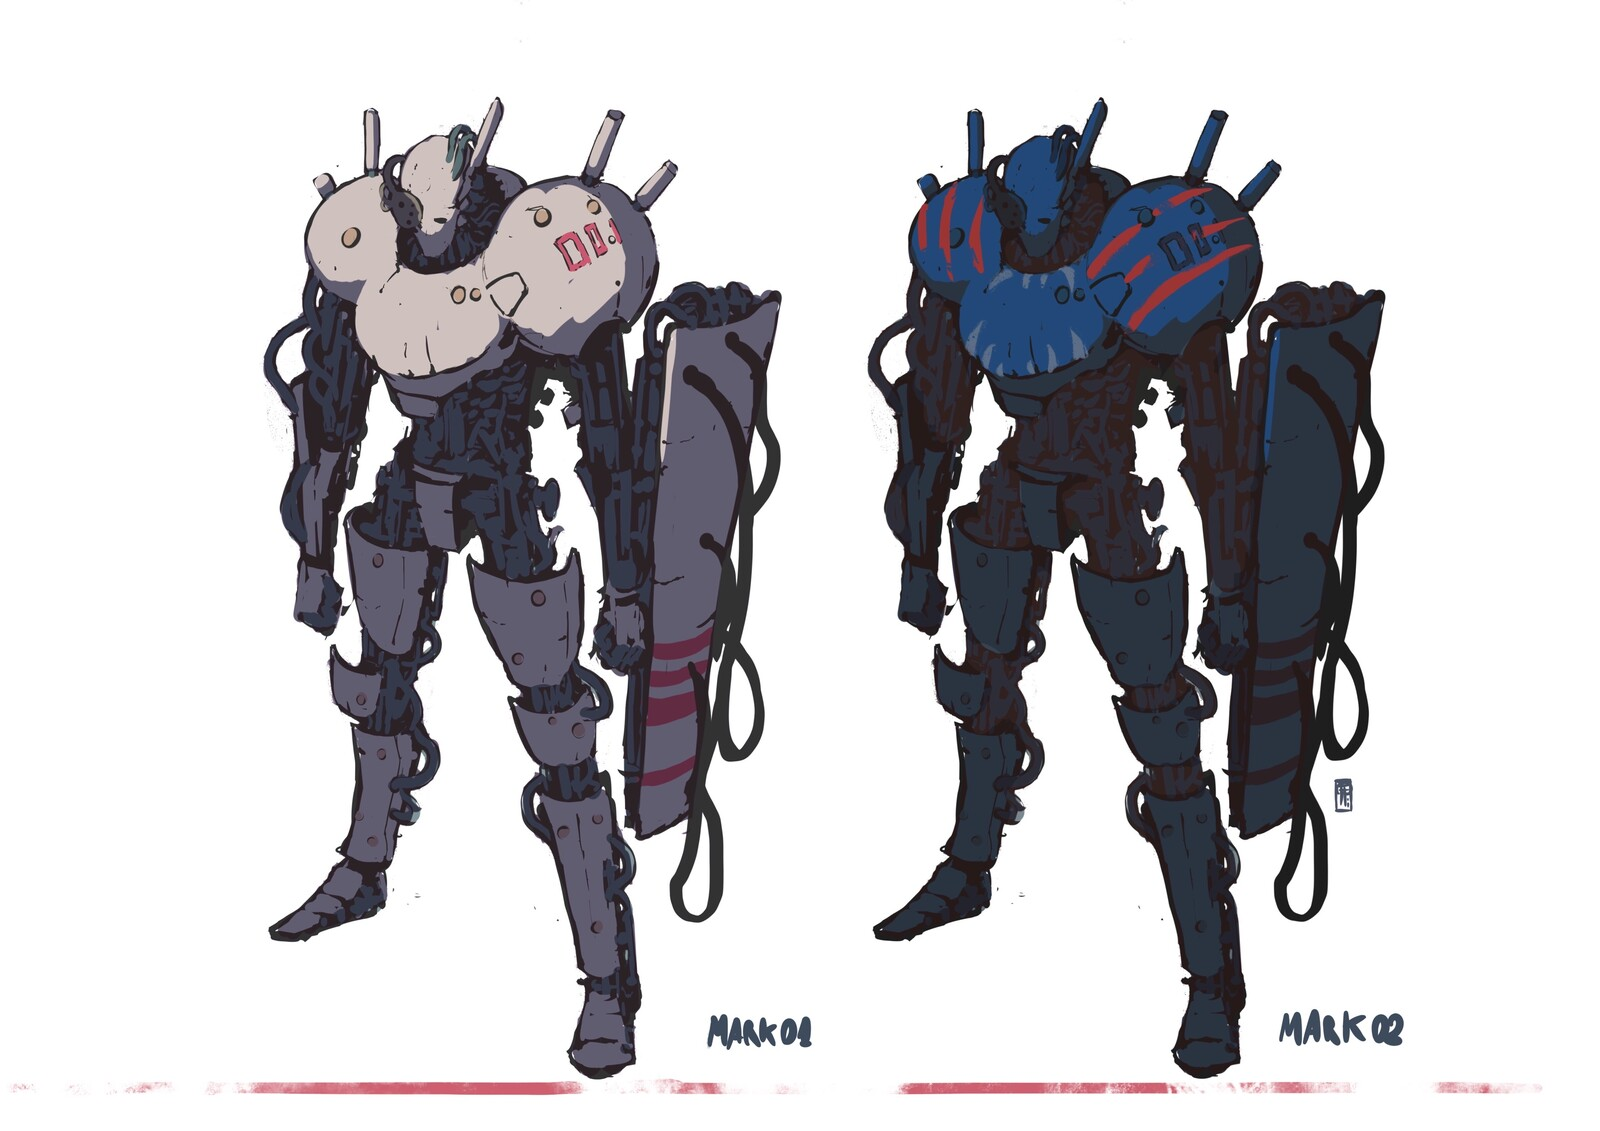 Mecha_doodles//Mark01_and_Mark02